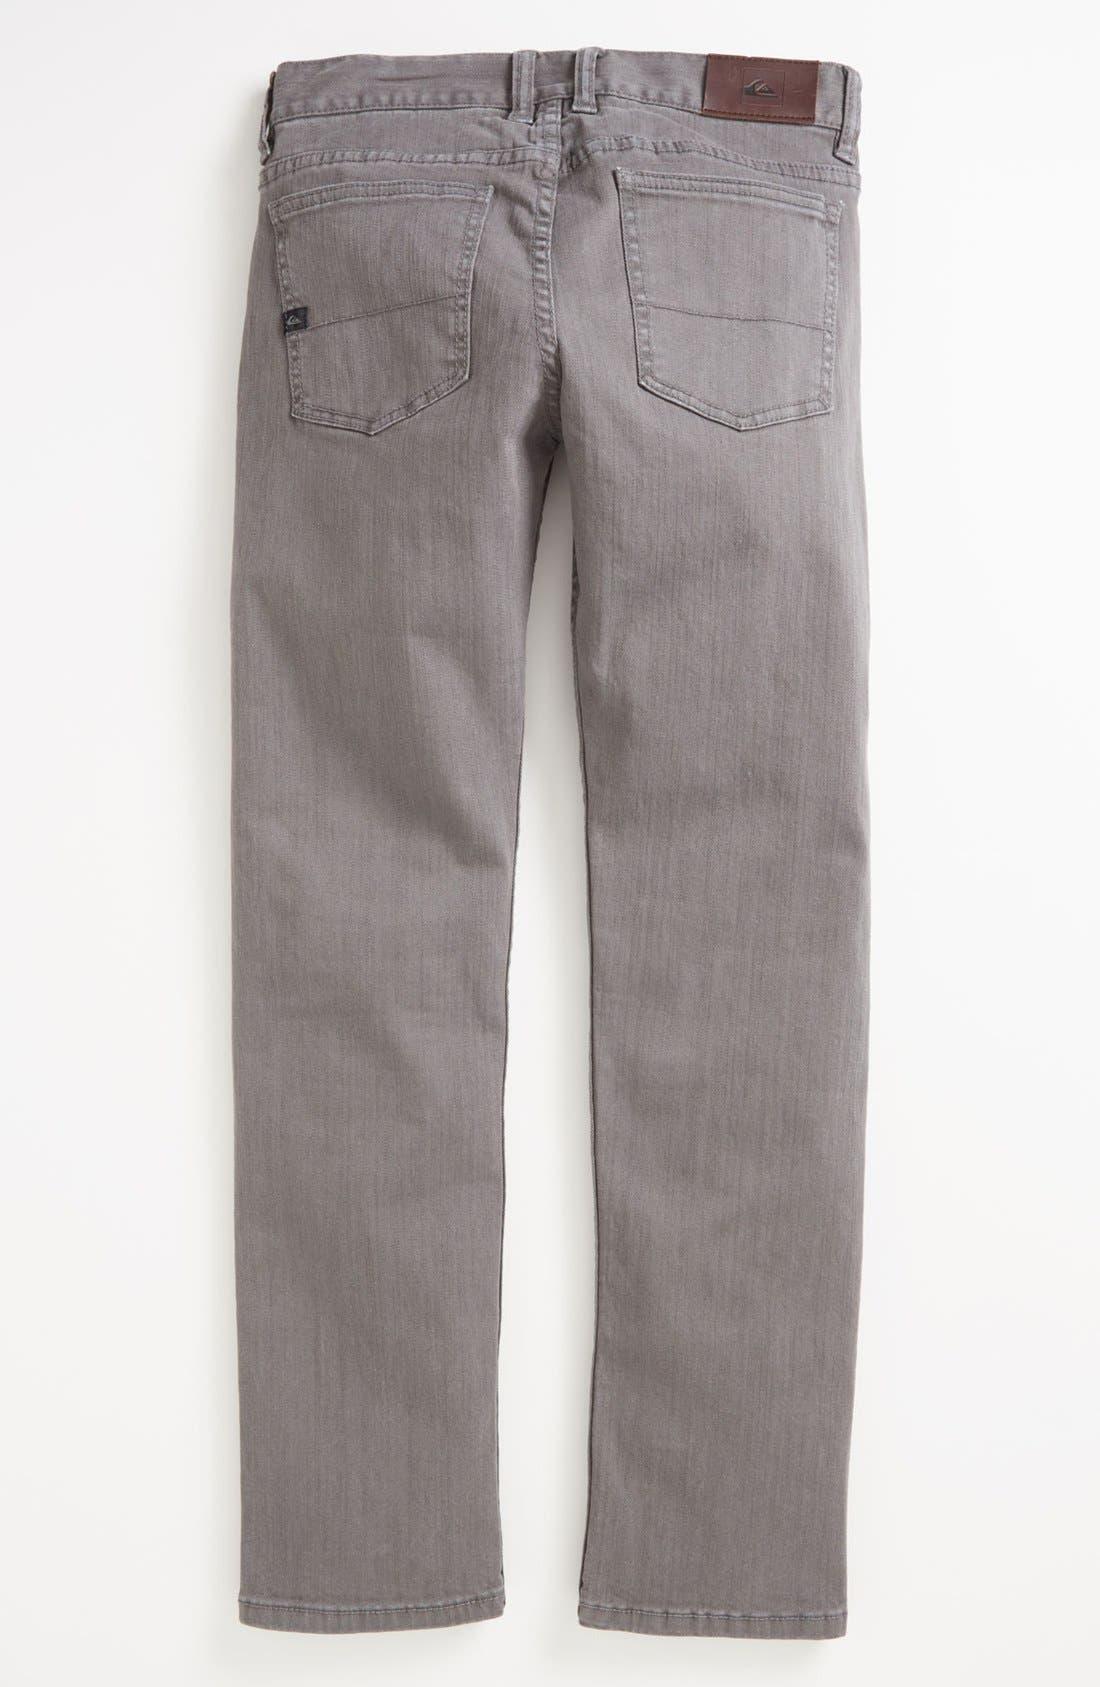 Alternate Image 1 Selected - Quiksilver 'Distortion' Slim Straight Leg Jeans (Little Boys)